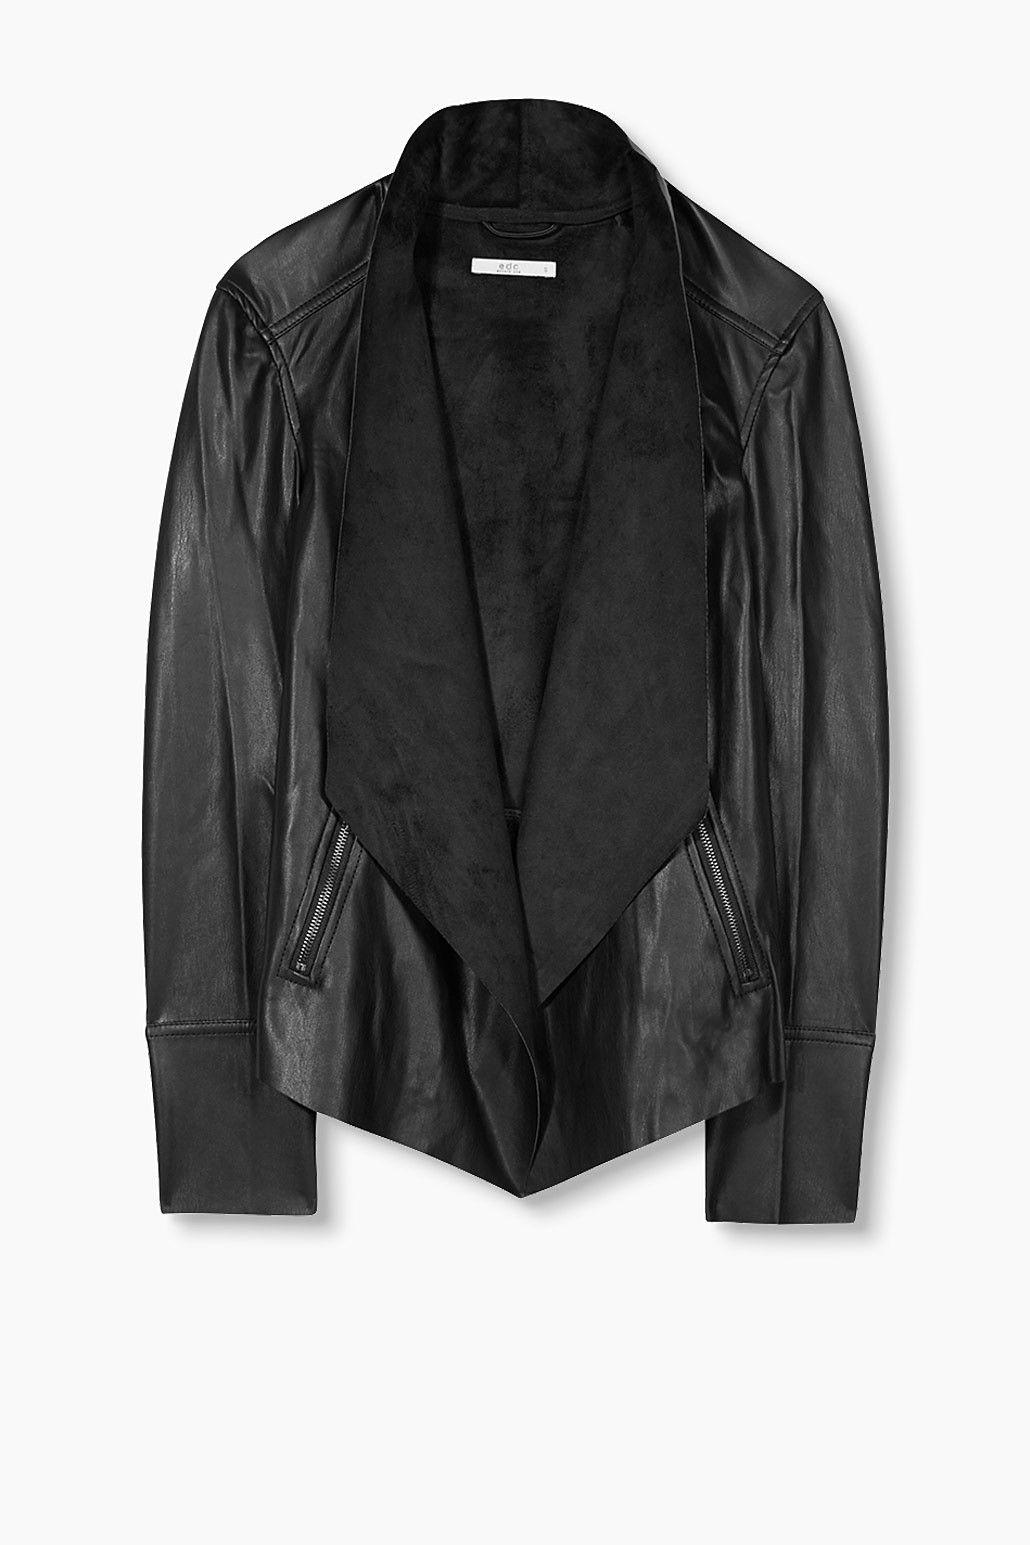 Style En Blazer Edc Vêtements Achats Similicuir Veste 8aqZtwSO